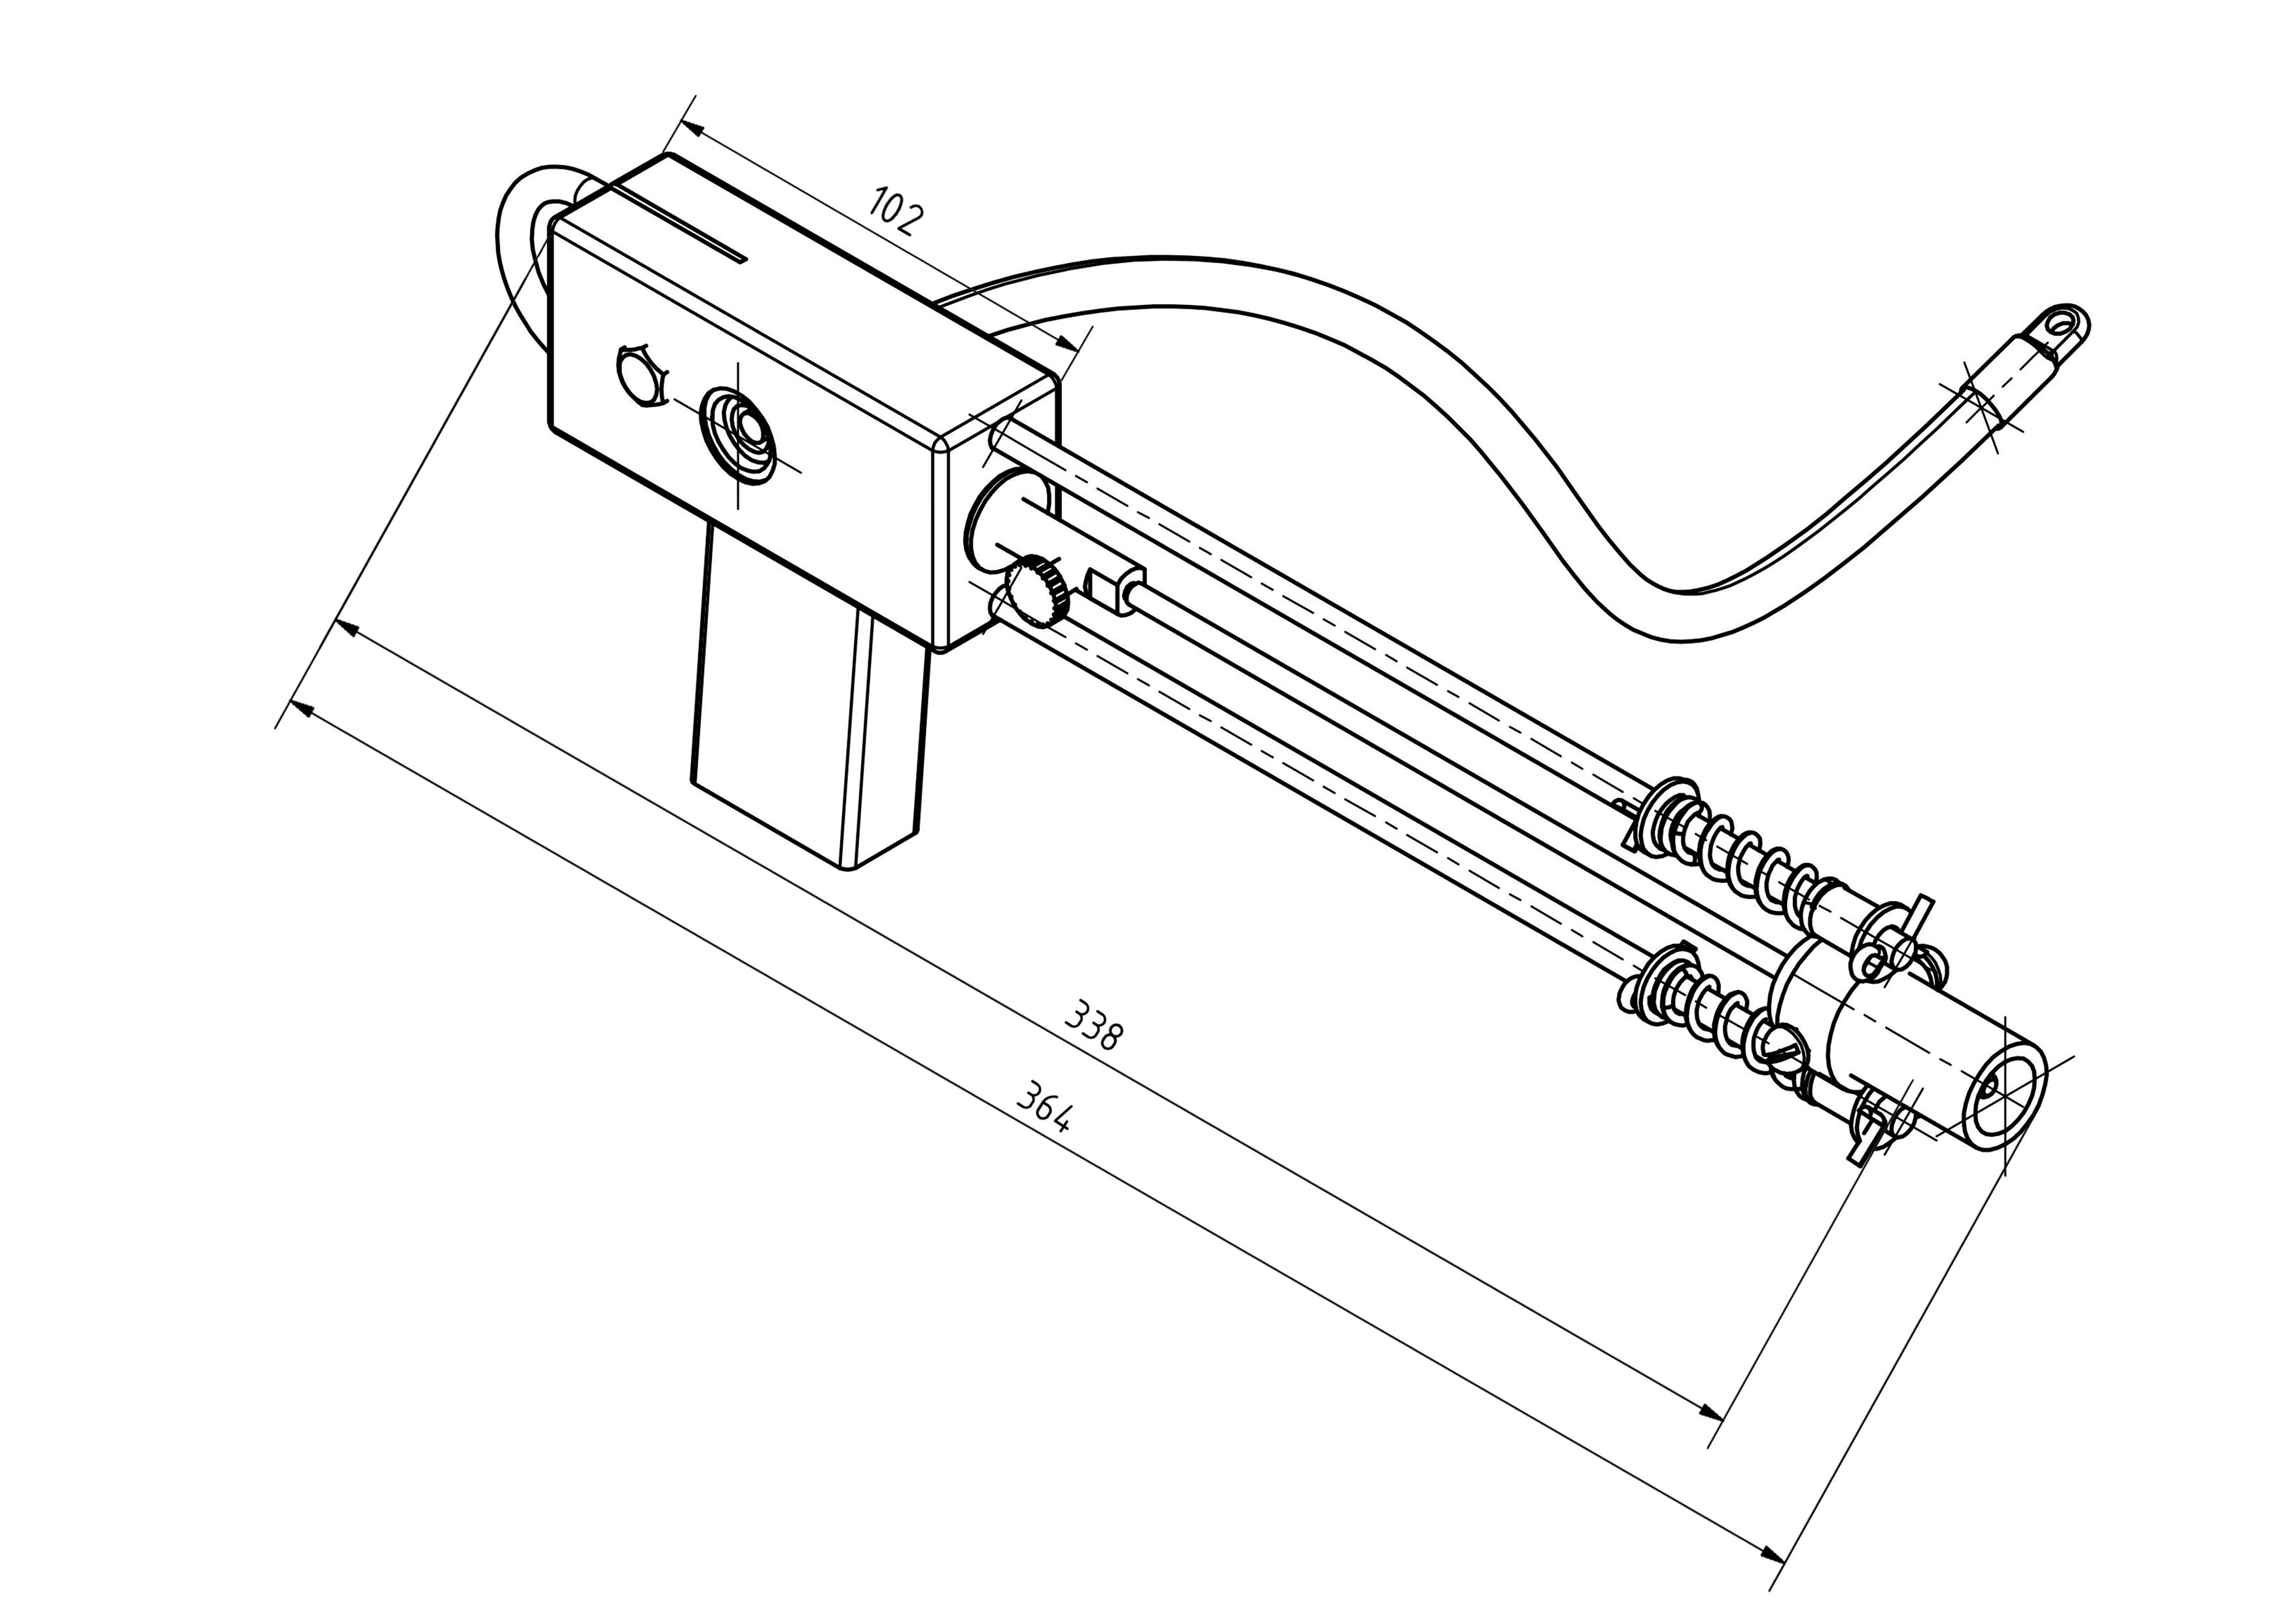 Oho wg welding-gun-multifuntional-and-diy 0000.jpg